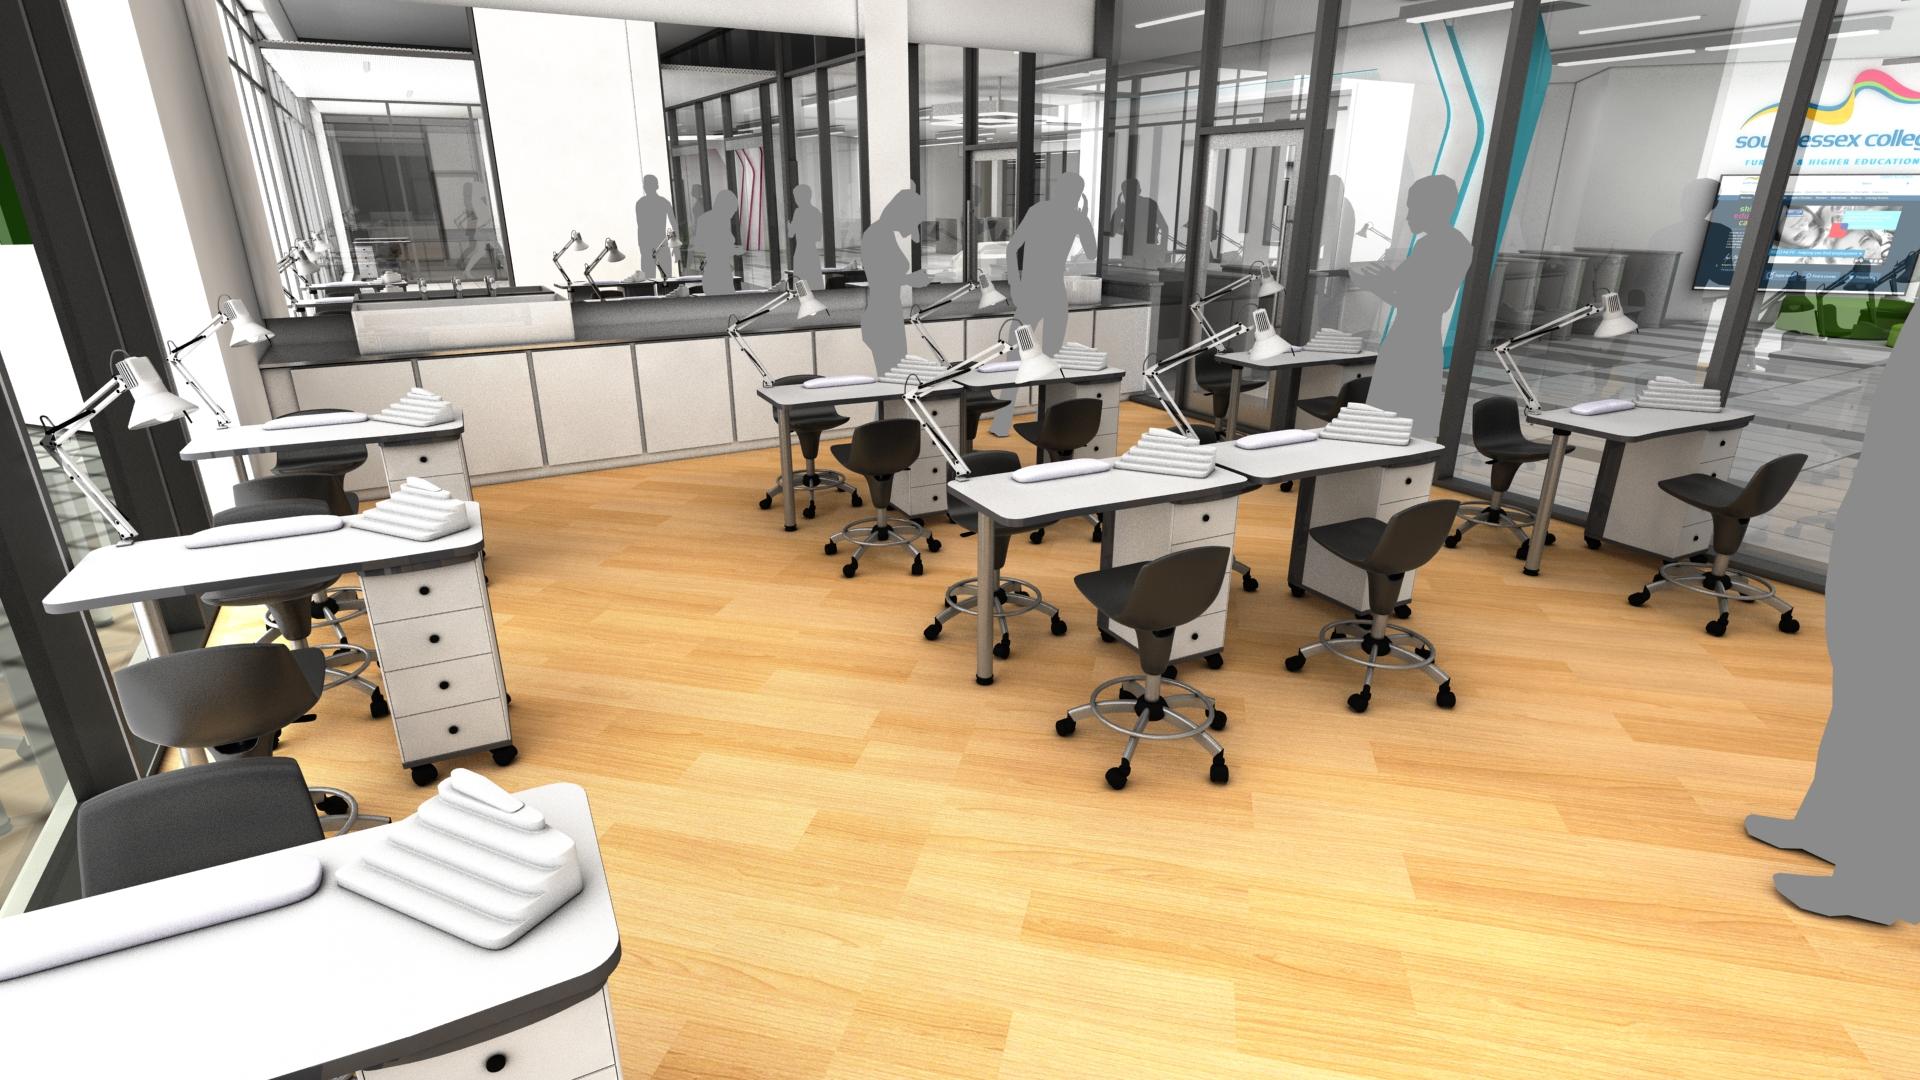 South Essex College Architectural 3D Render-16.jpg